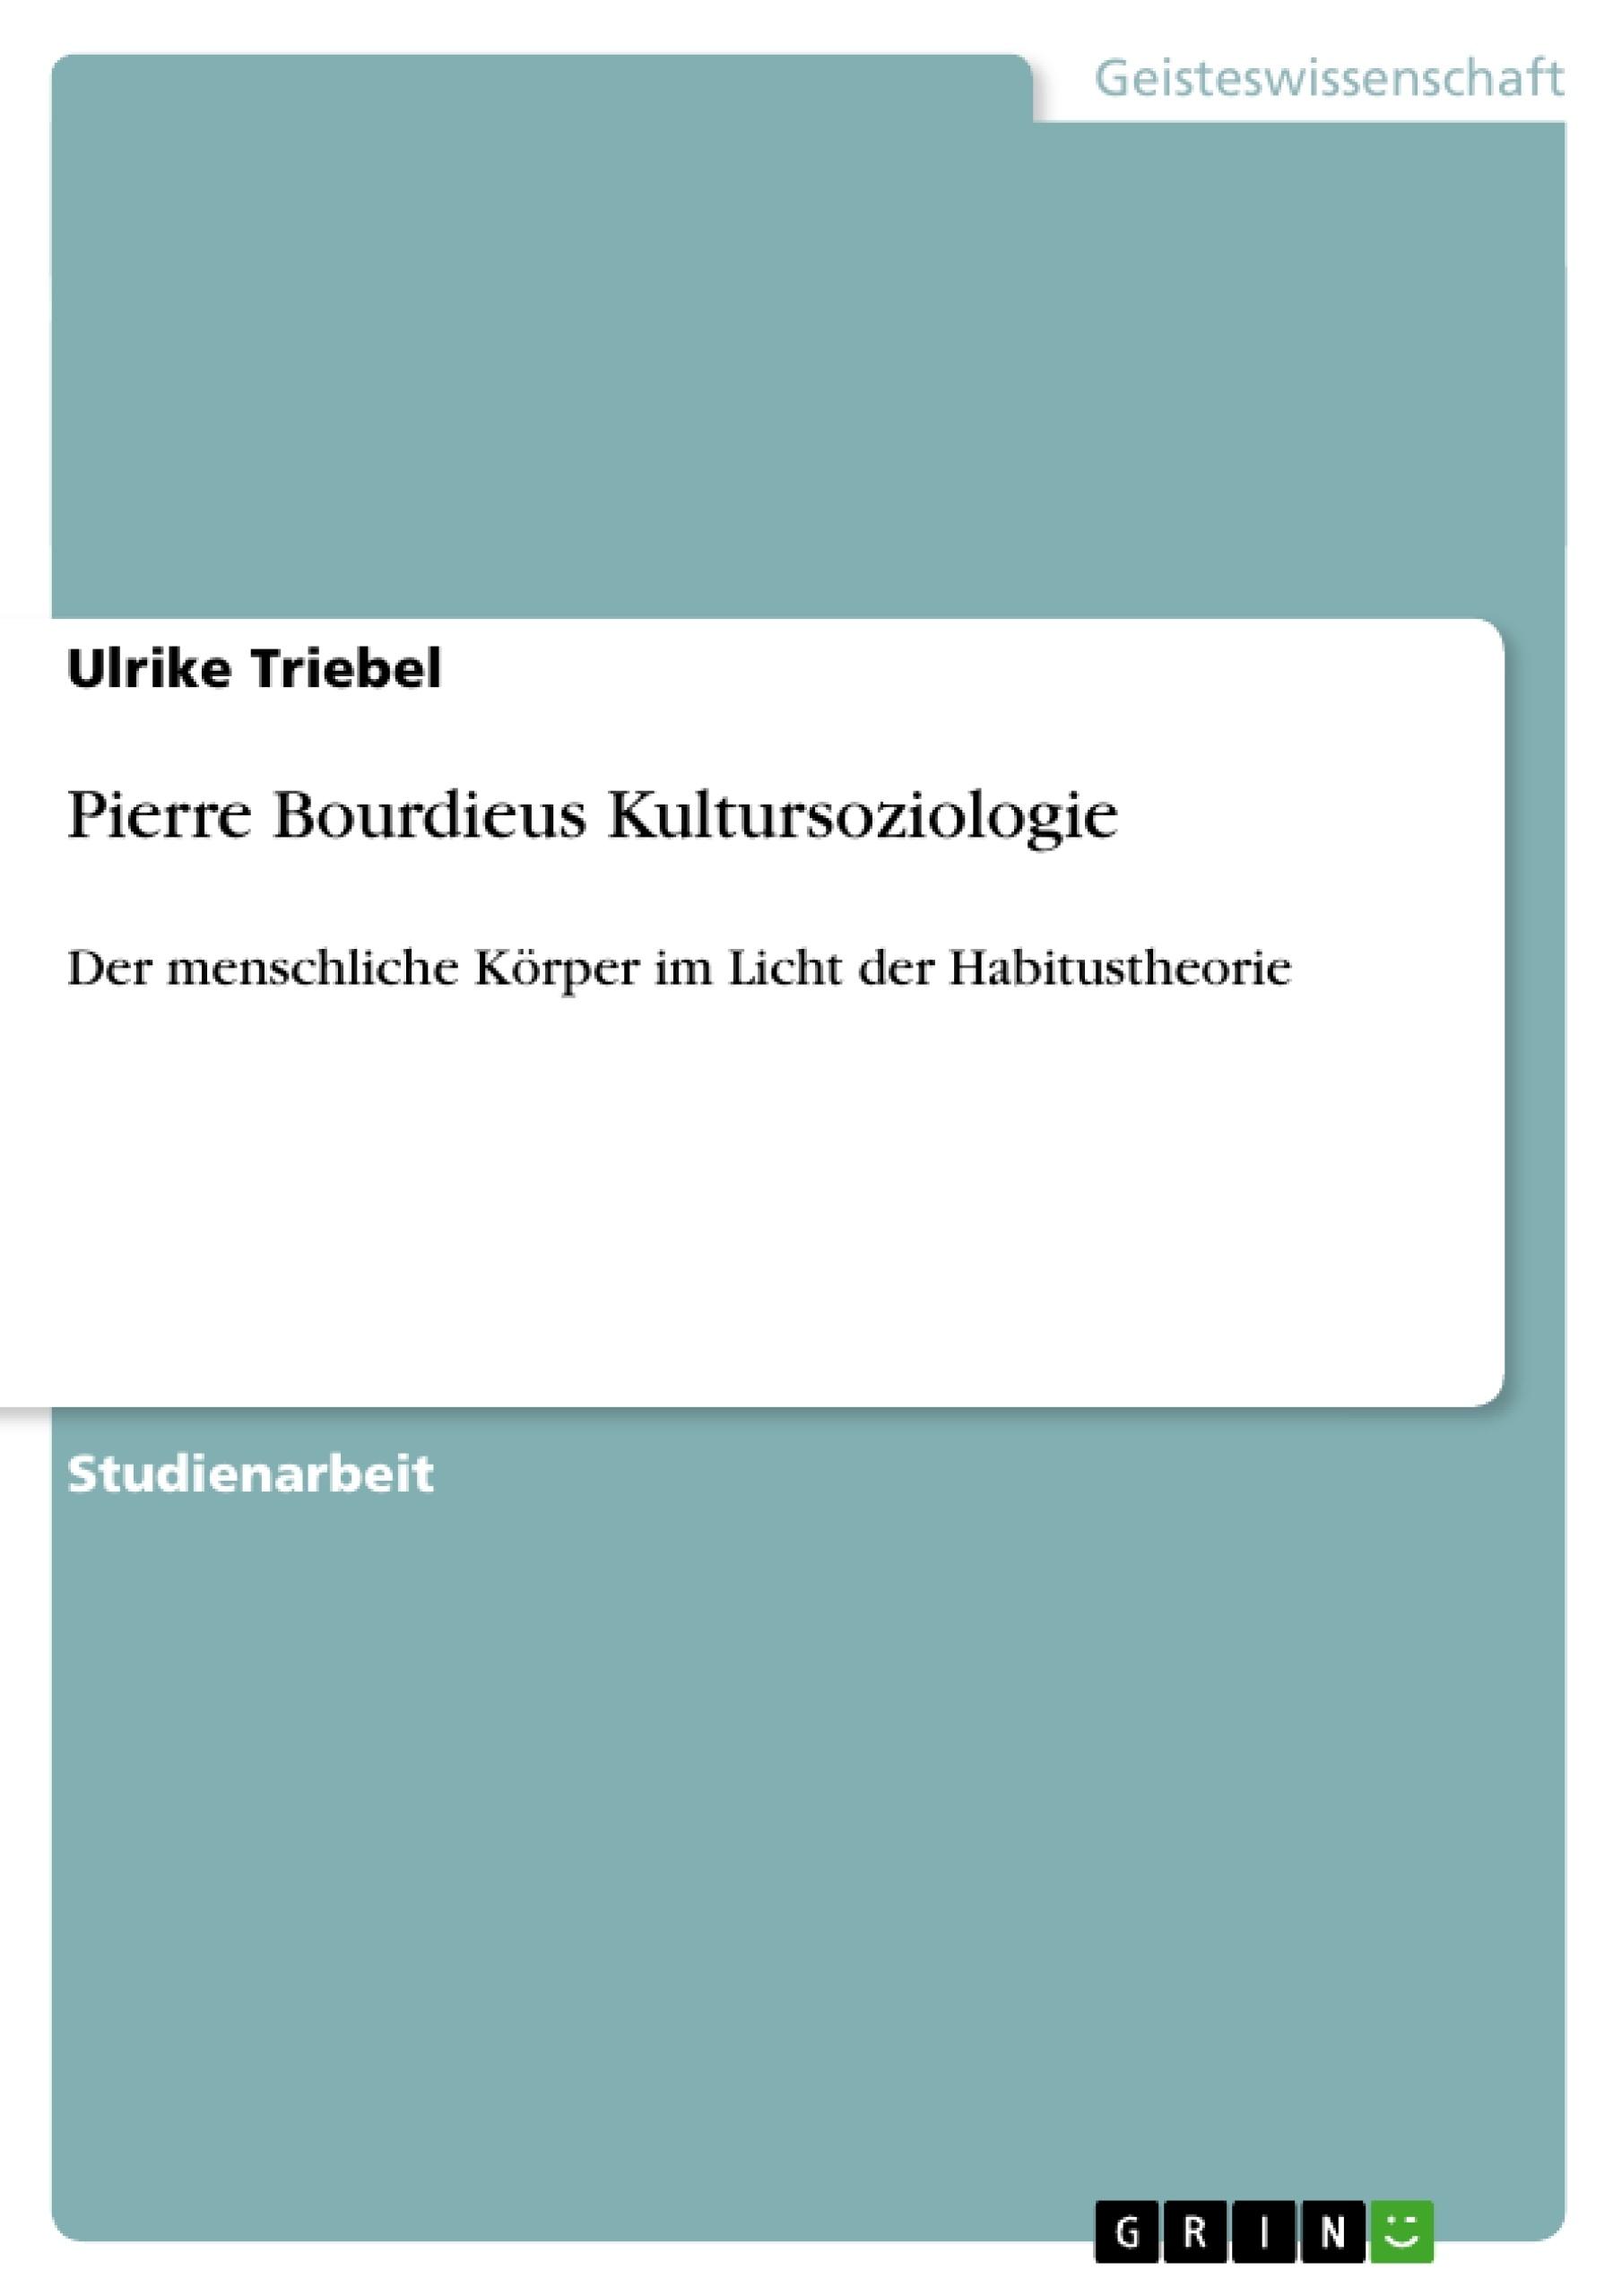 Titel: Pierre Bourdieus Kultursoziologie